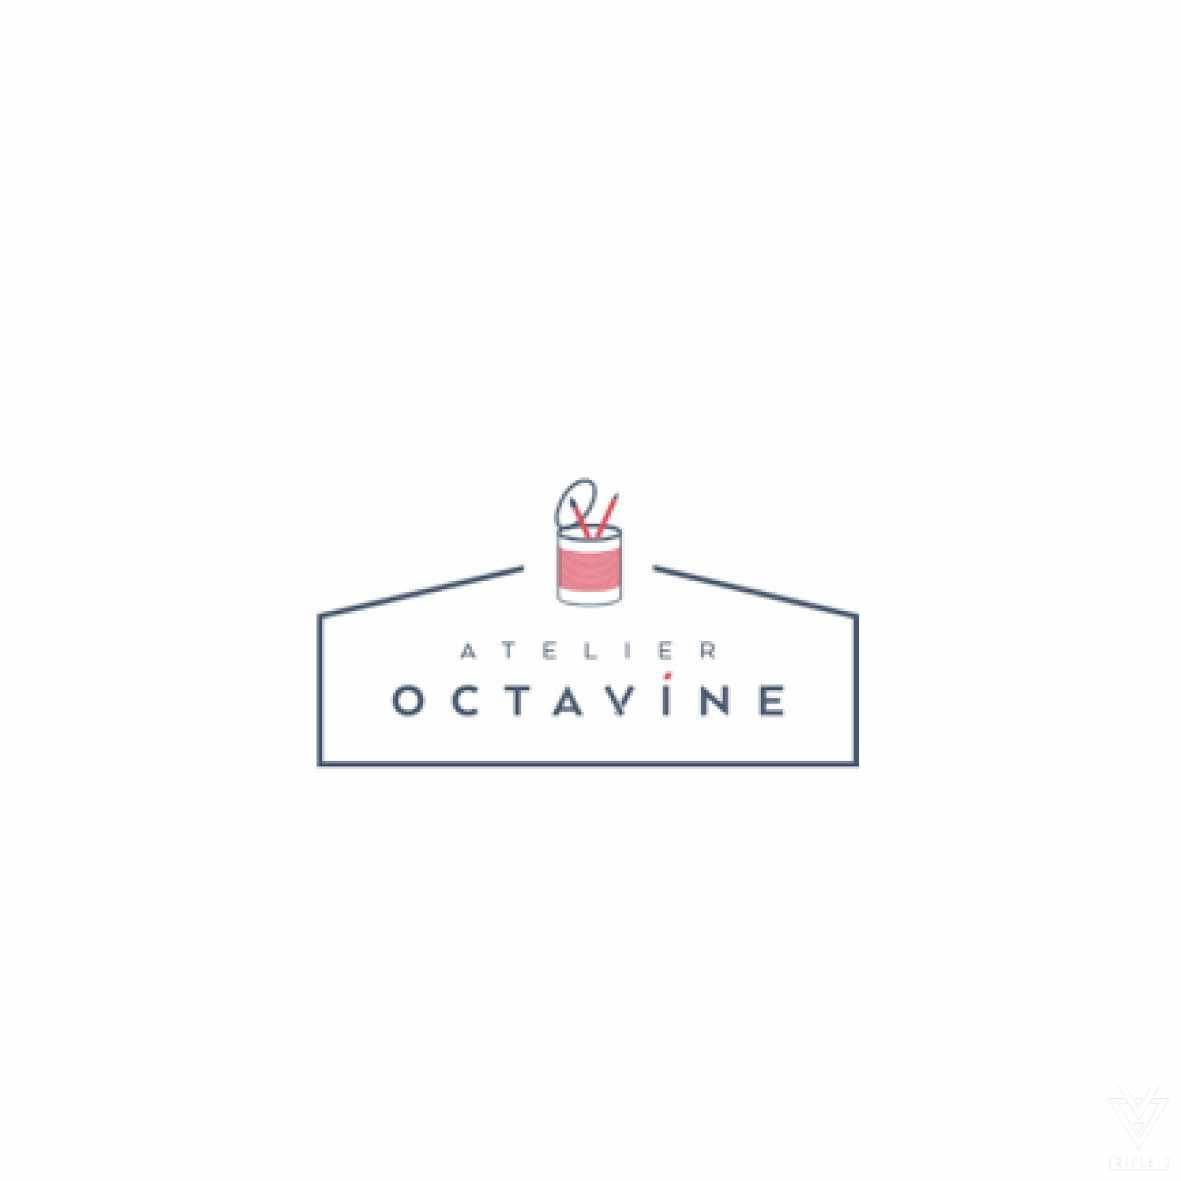 Atelier Octavine